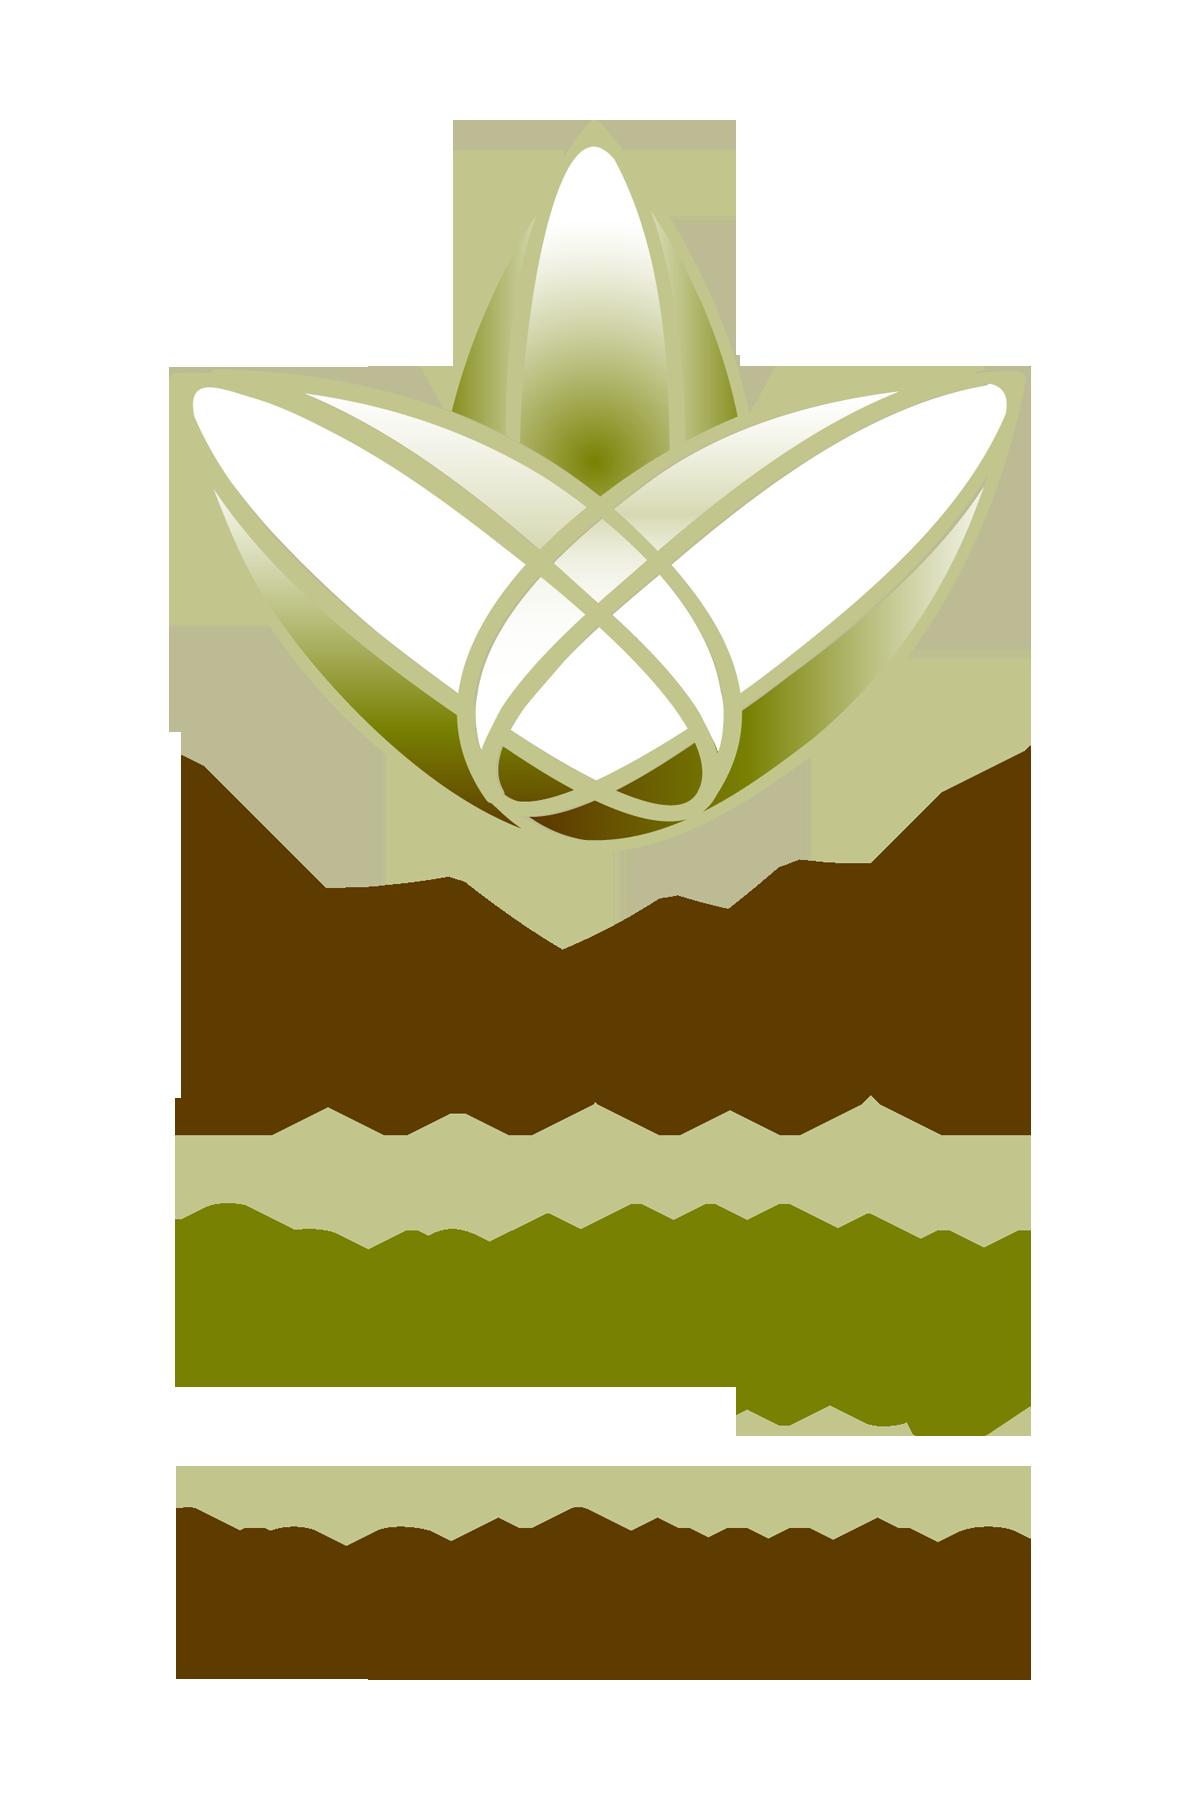 Lane Fertility Institute